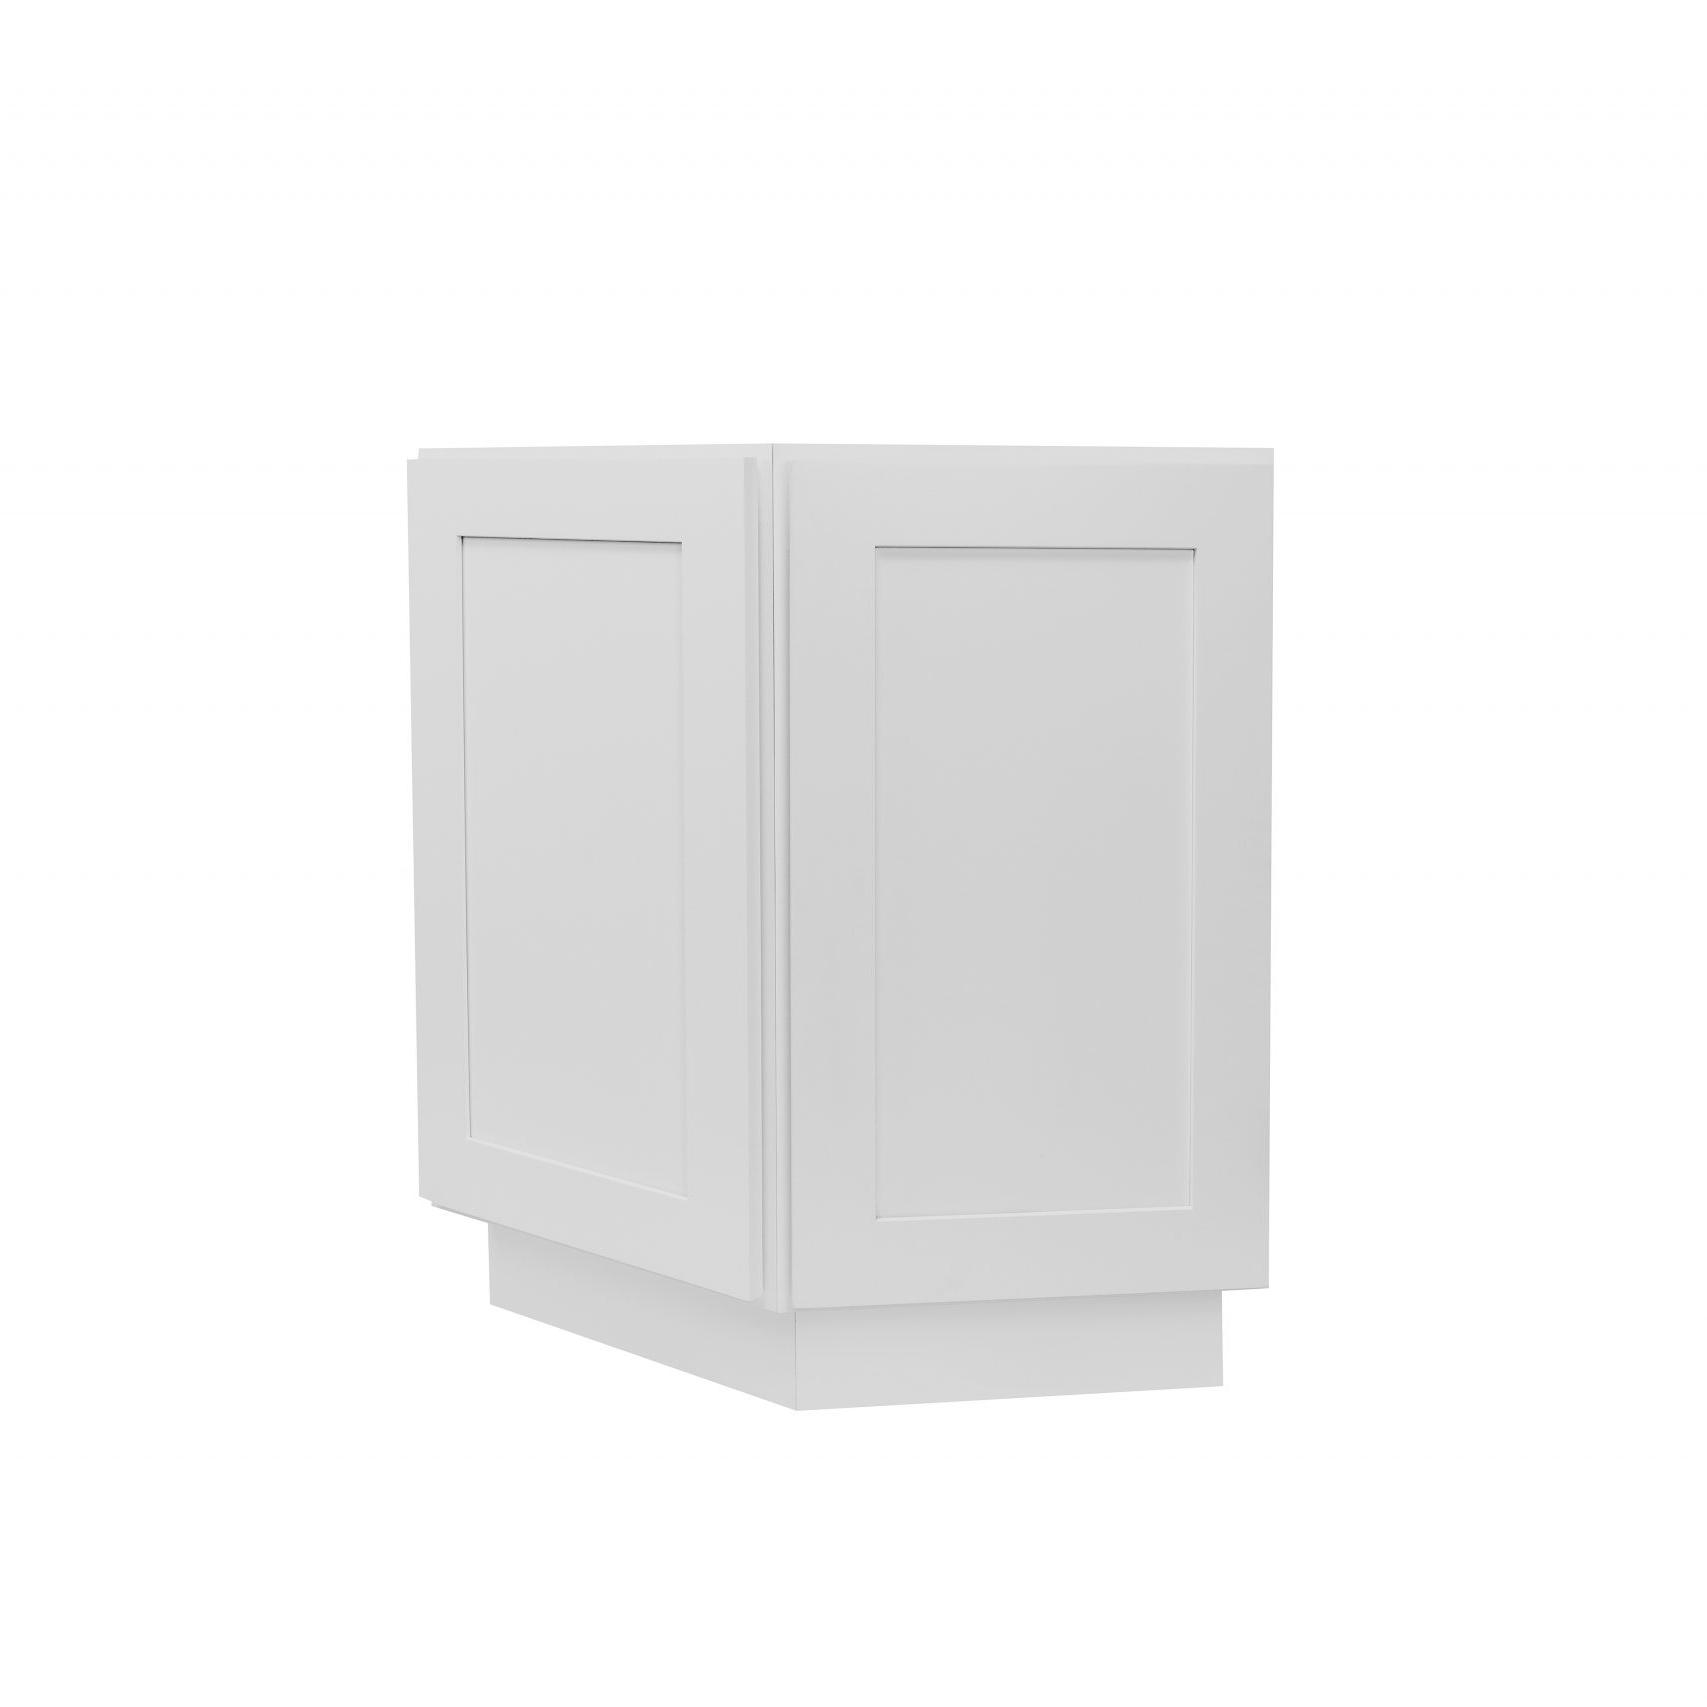 Gray Shaker Cabinetry BEA24